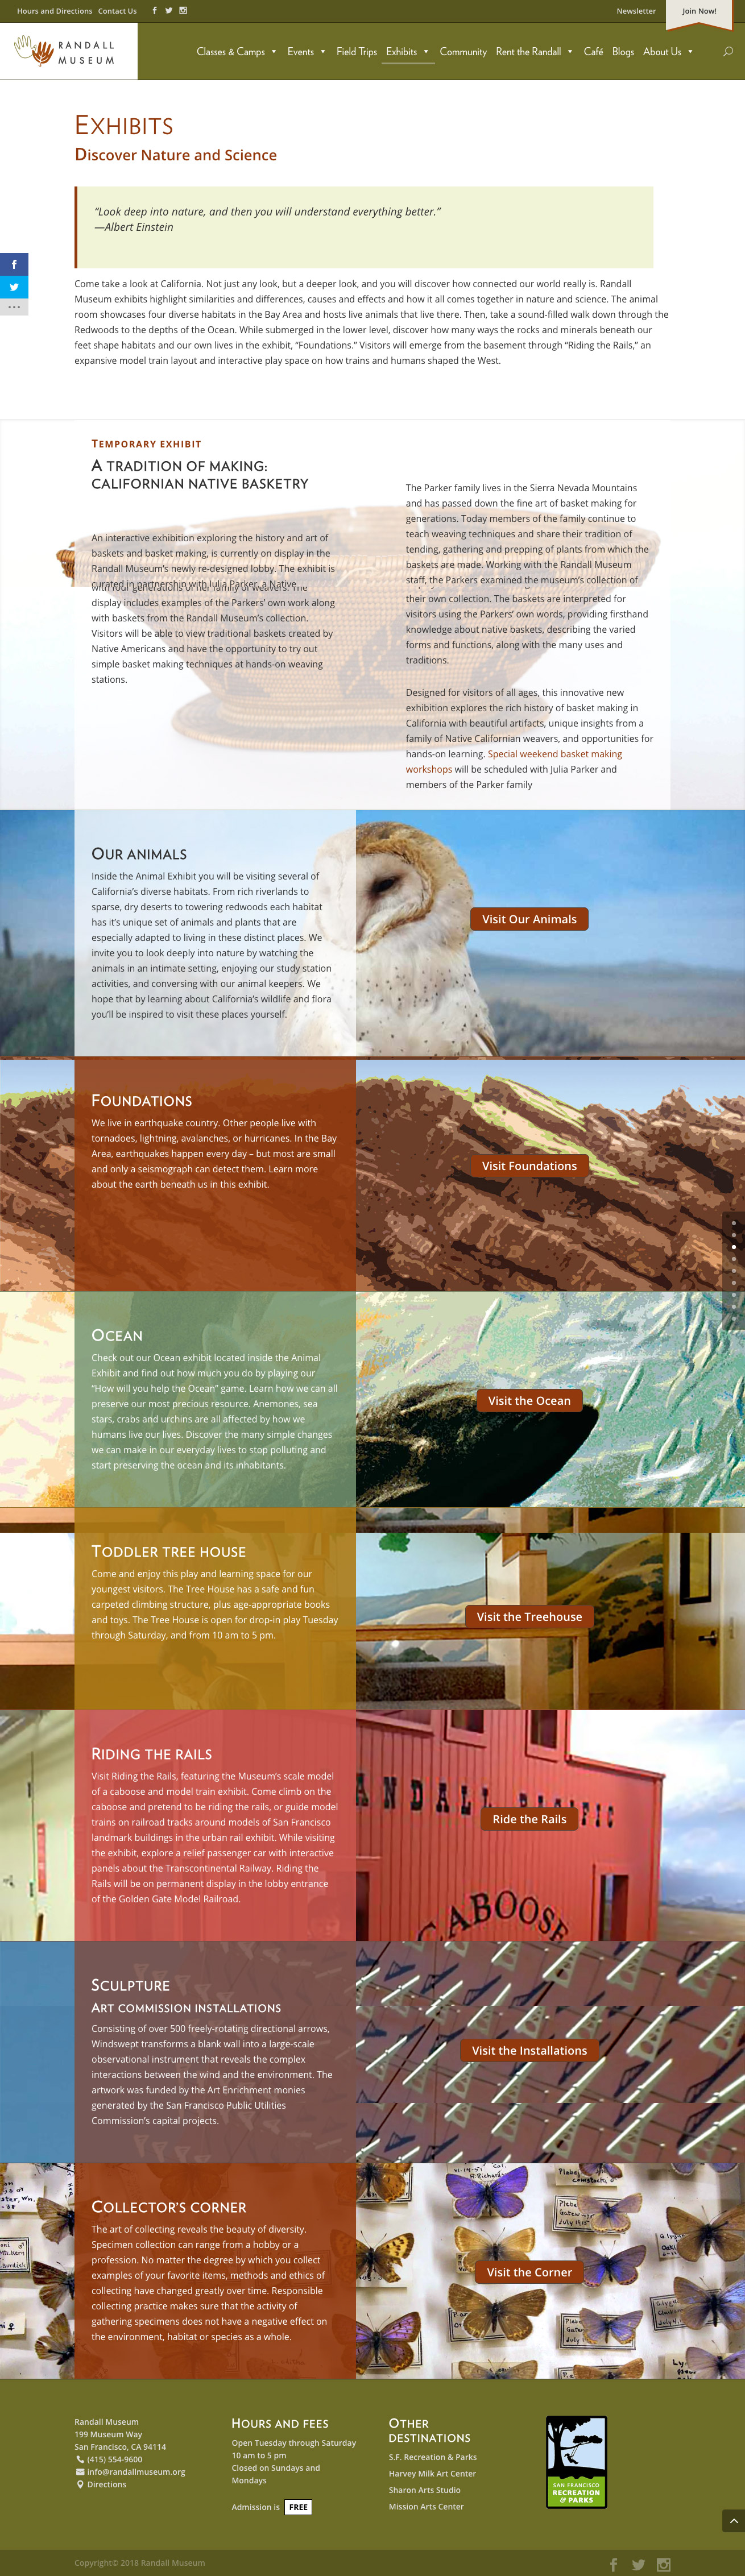 randallmuseum-org-exhibits